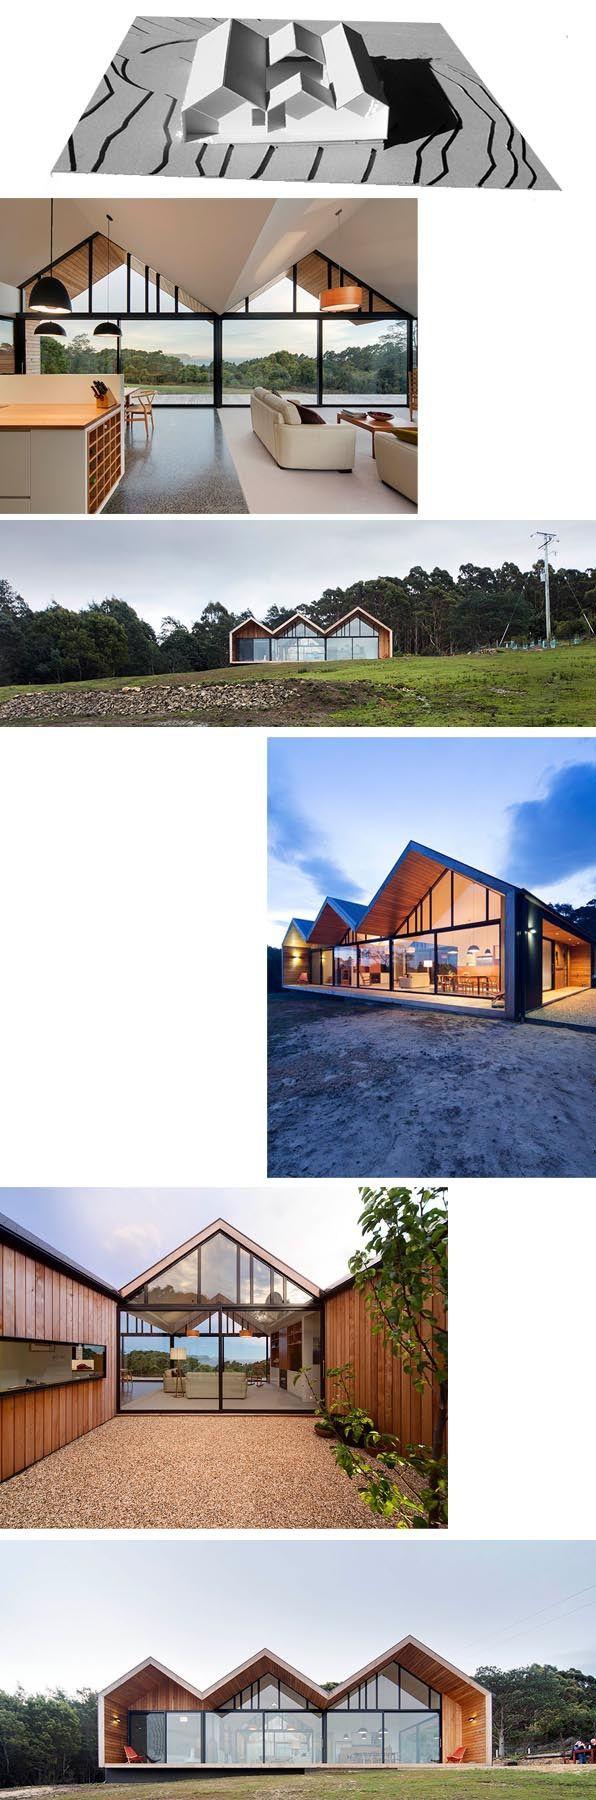 Arquitectura modular prefabricada industrializada casa vivienda contemplaci n architecture house - Archi moderni casa ...